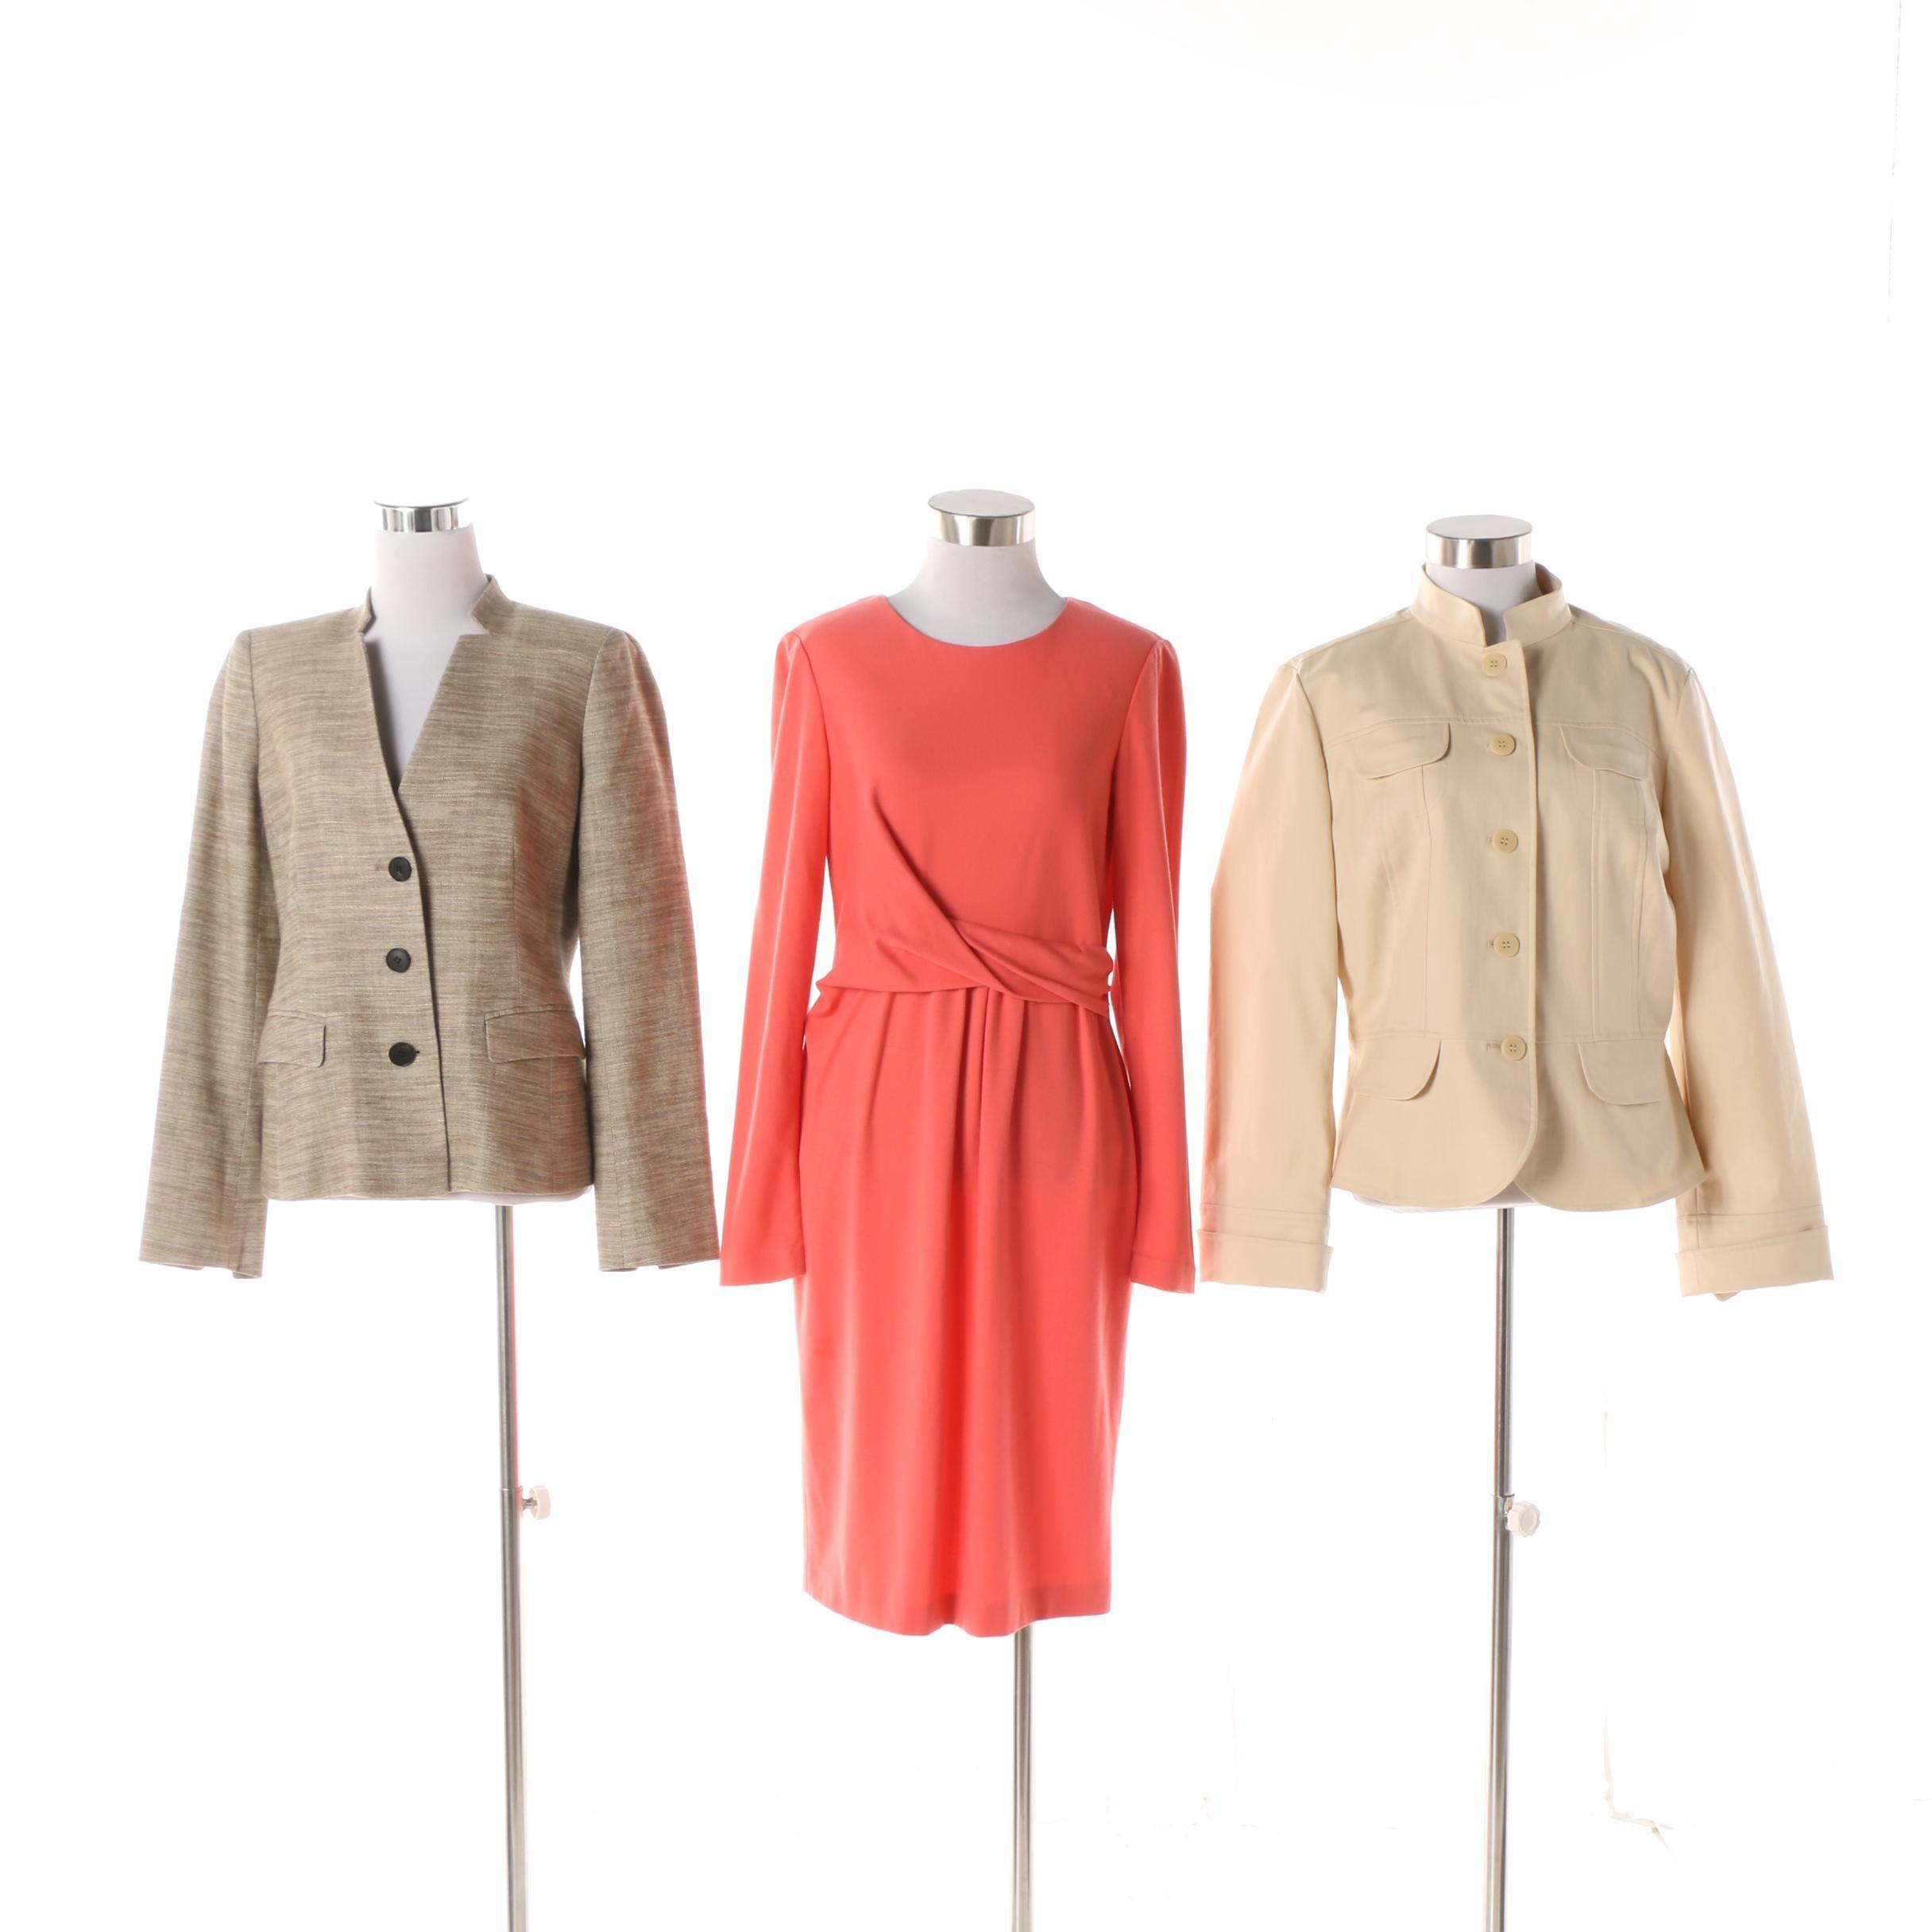 Women's Lafayette 148 New York Jackets and Dress